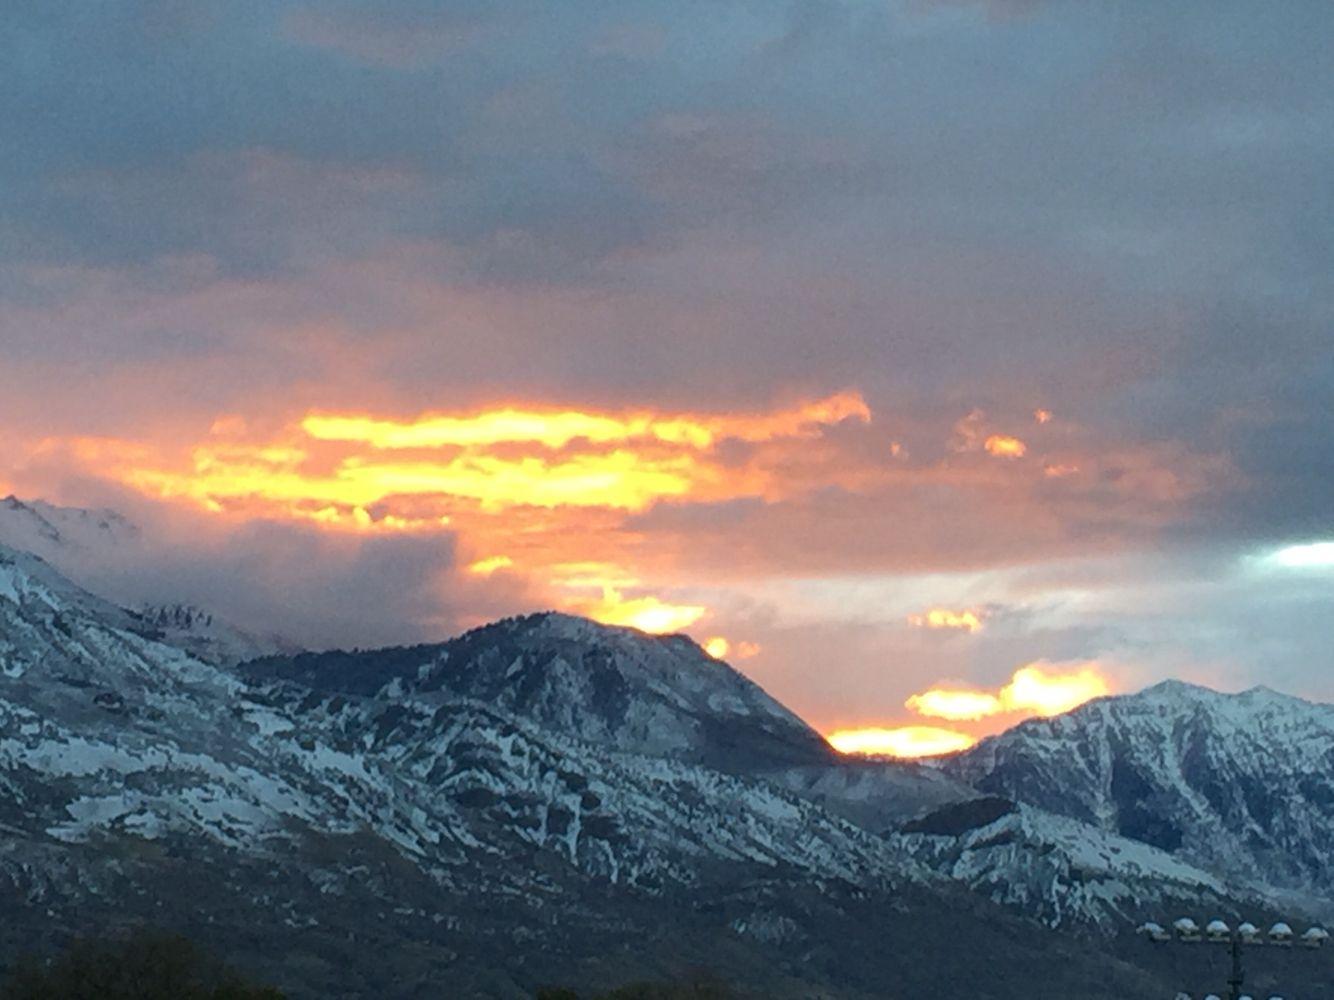 Sunrise from Draper